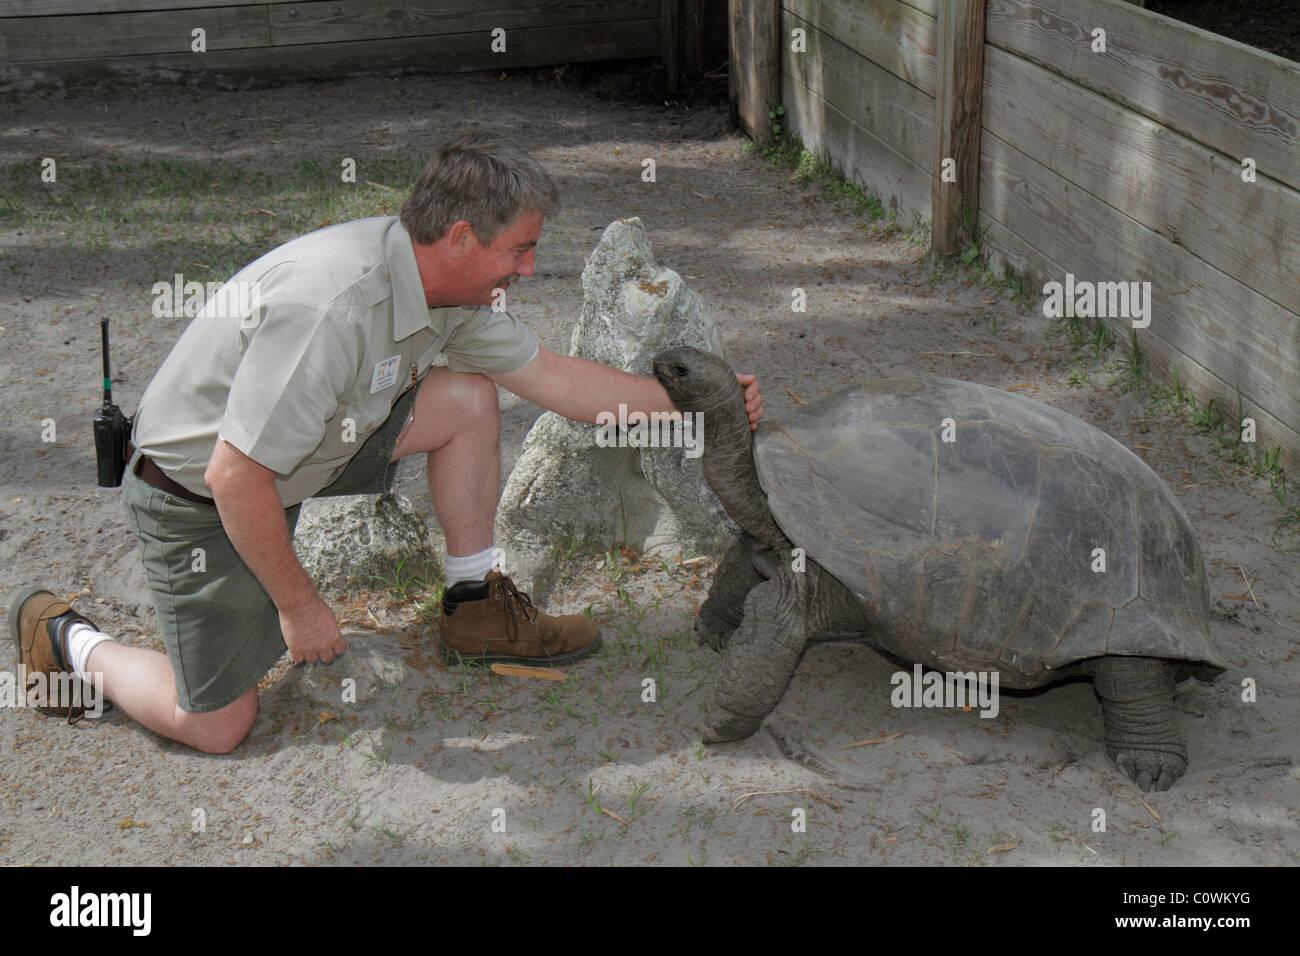 Orlando Florida Sanford Central Florida Zoo U0026 And Botanical Gardens Aldabra  Tortoise Dipsochelys Dussumieri Reptile Man Zookeepe